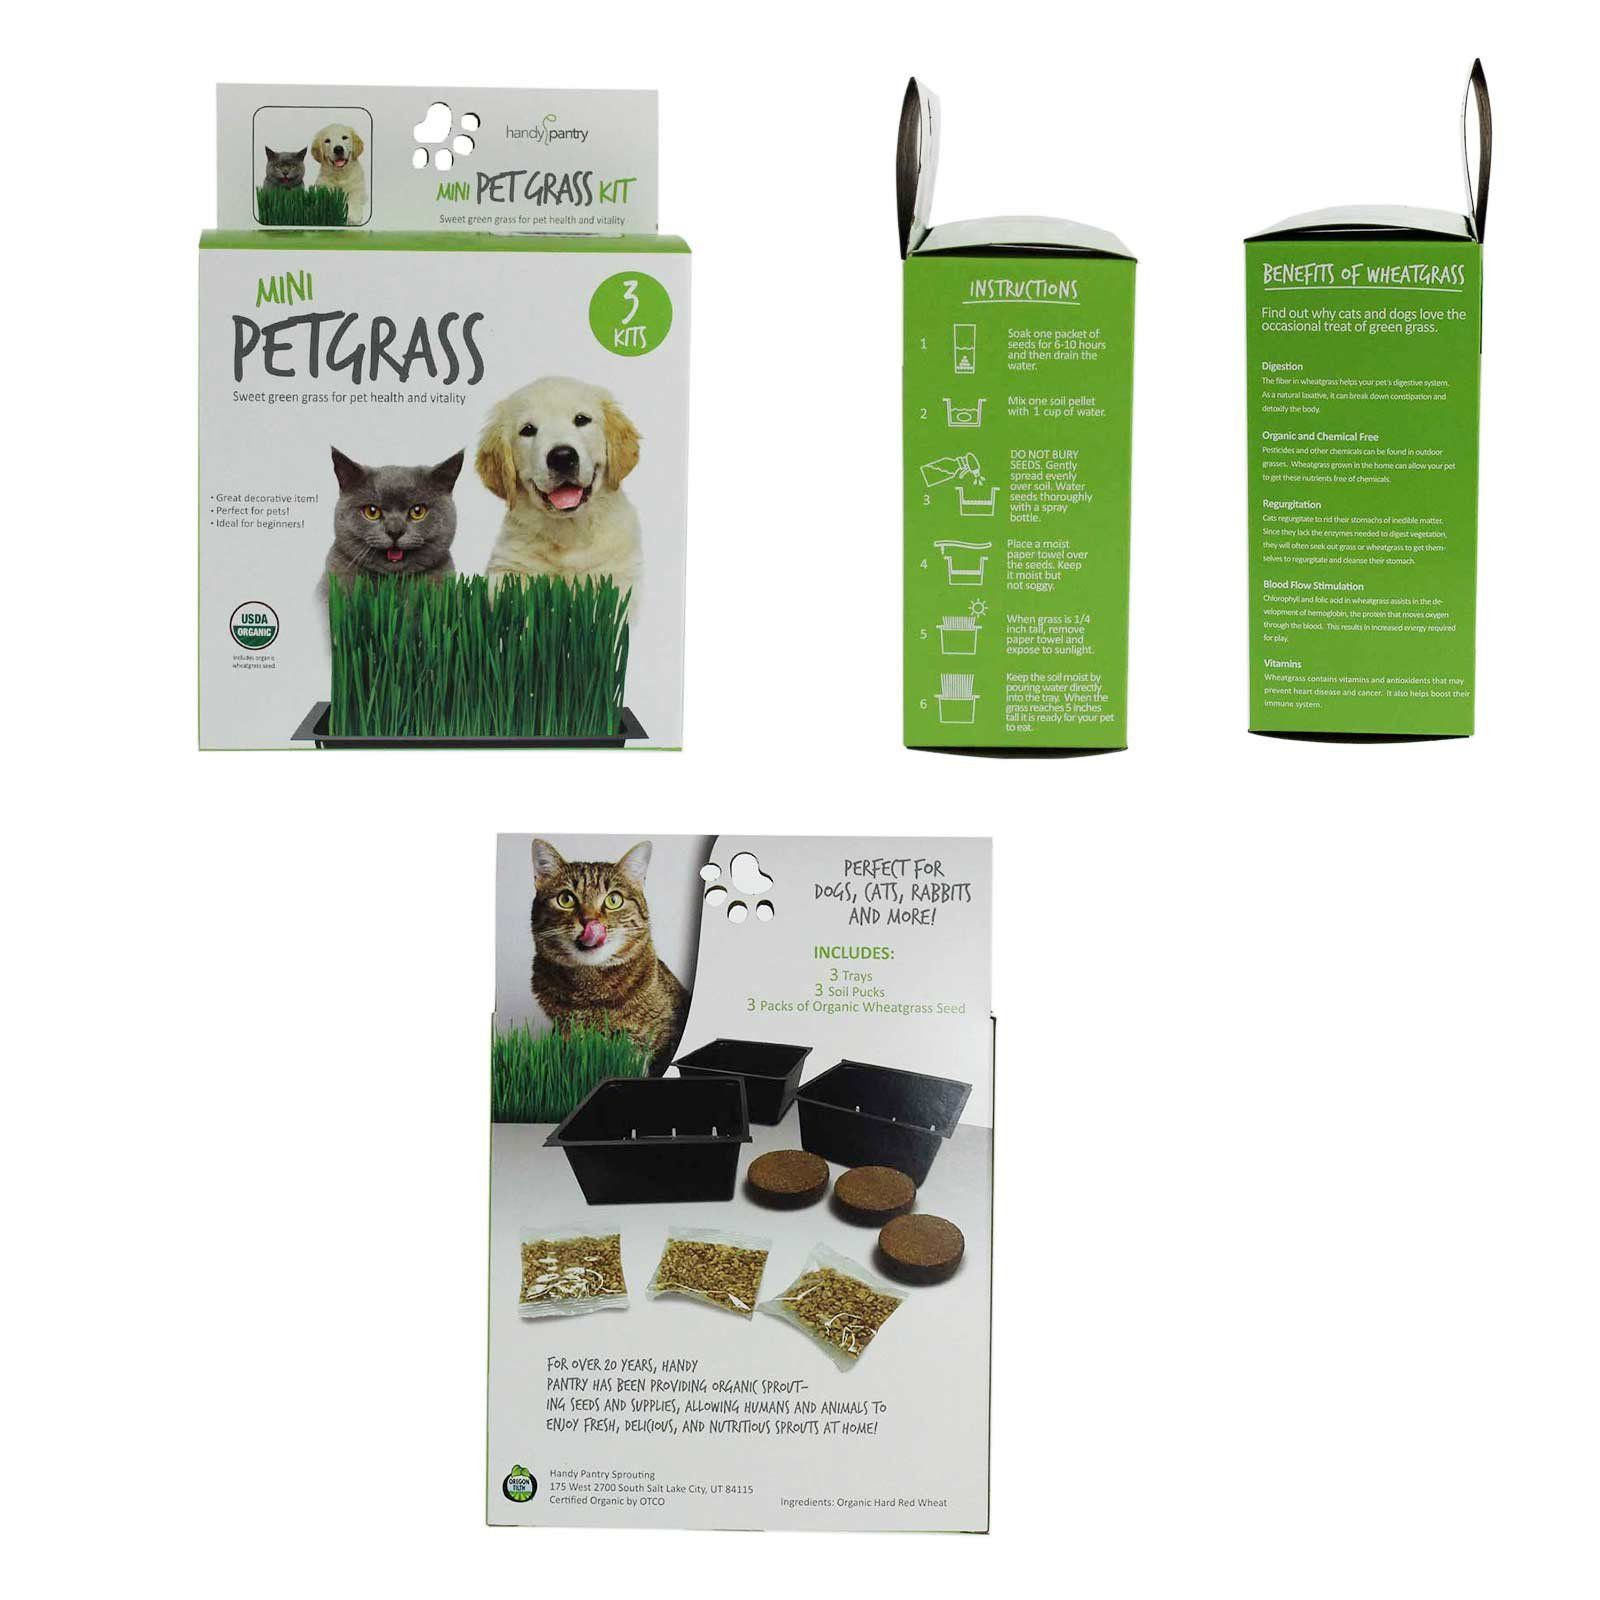 Wheatgrass Kits Mini Organic Pet Grass Kit Grow Wheatgrass For Pets Dog Cat Bird Rabbit More Includes Trays Soil Wheat Grass Seeds Instru With Images Organic Pet Products